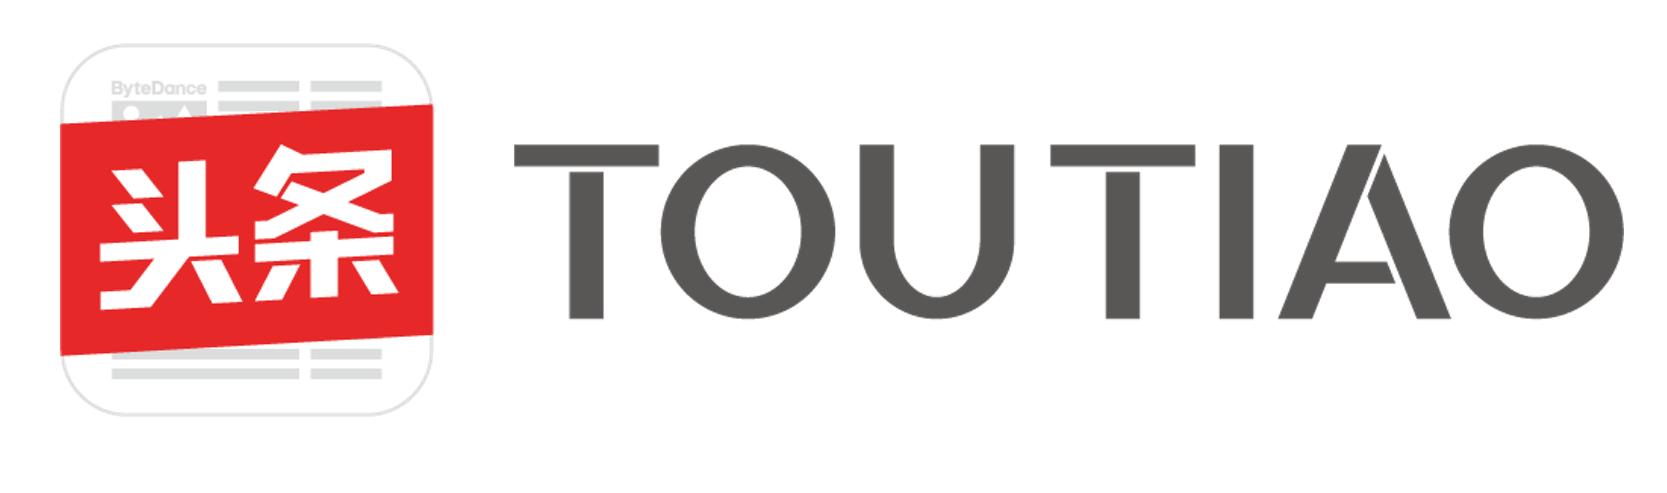 Toutiao Leads The Way On Media Aggregation - Marketing China